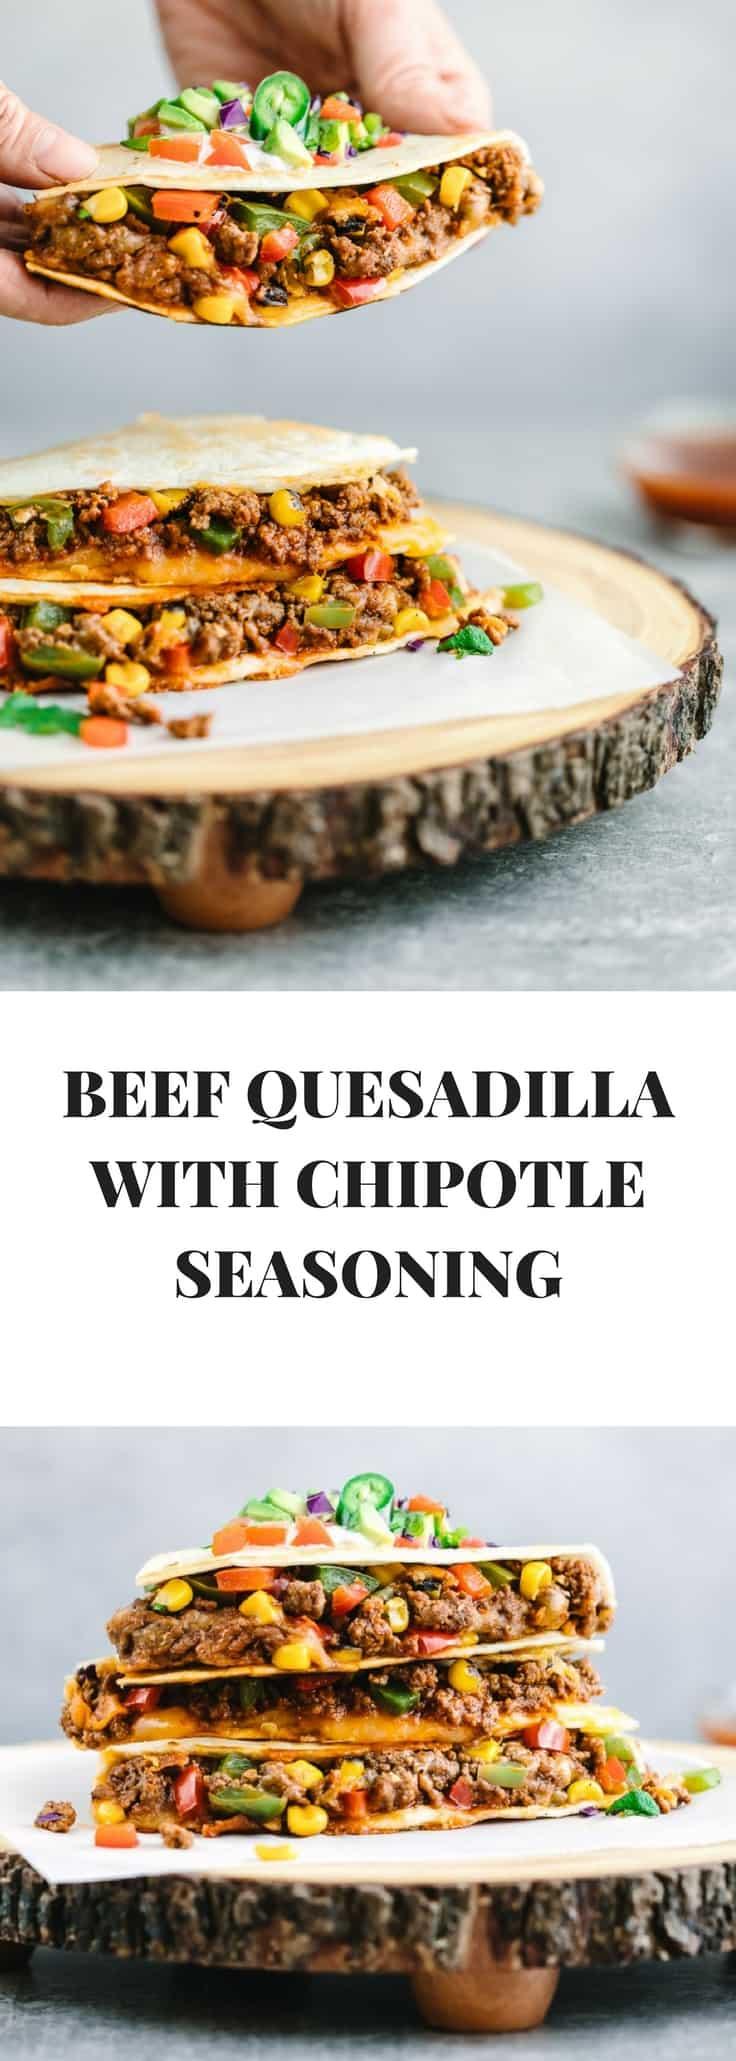 ground-beef-quesadilla-recipe-pinterest.jpg